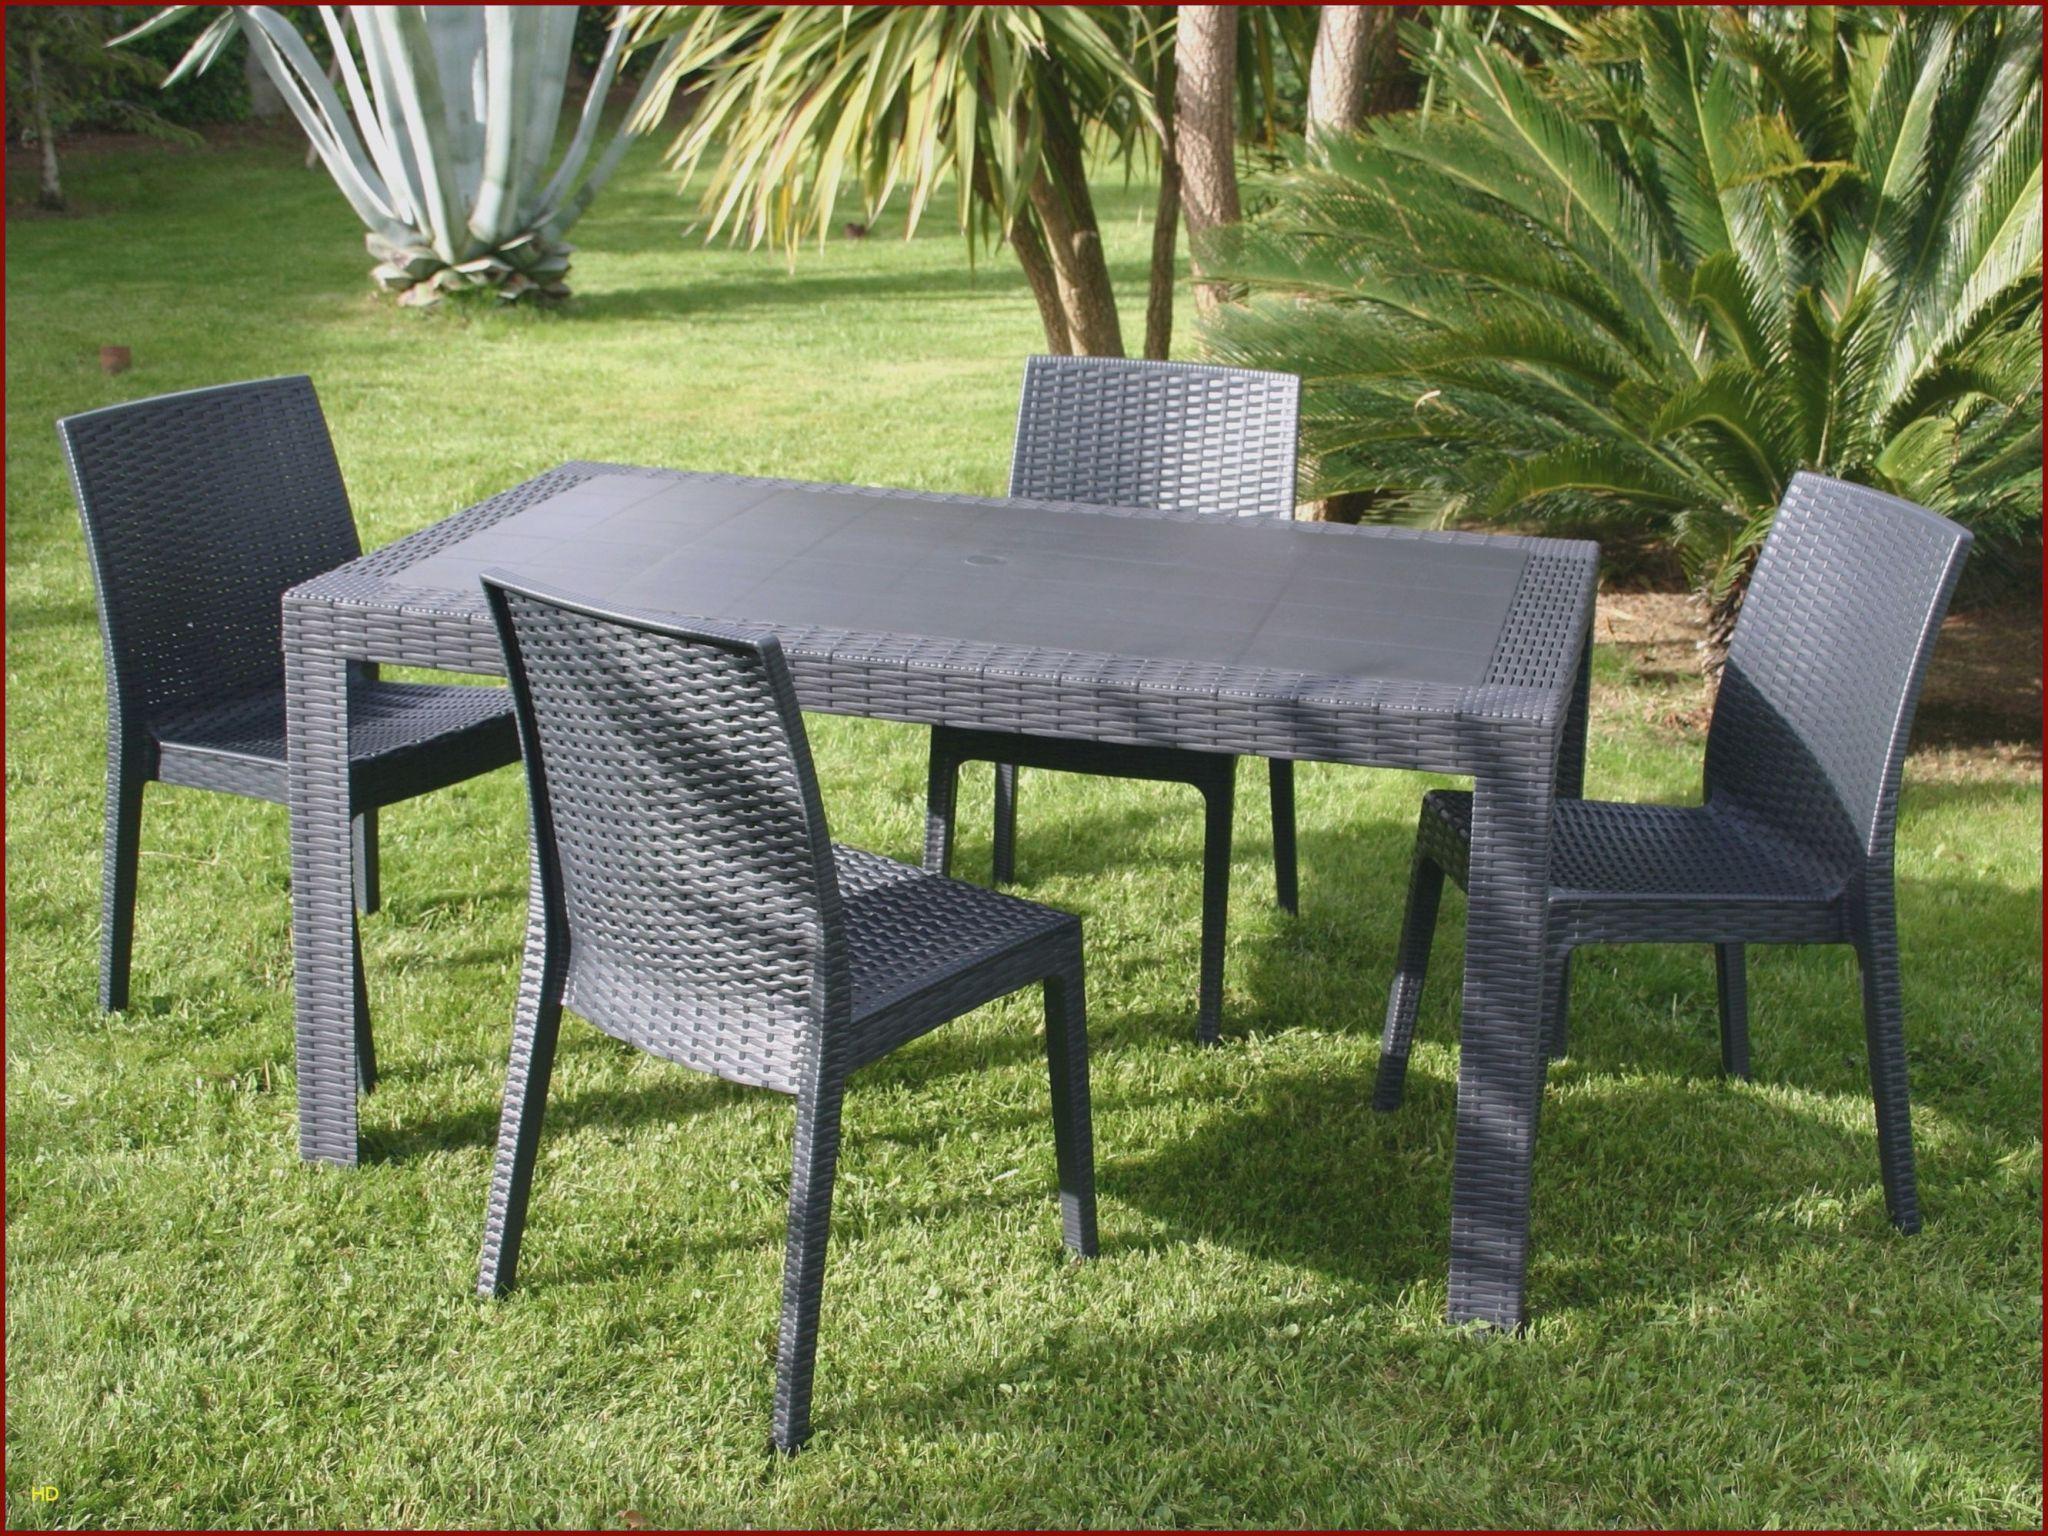 Salon De Jardin 10 Personnes Inspirant Chaises Luxe Chaise Ice 0d Table Jardin Resine Lovely